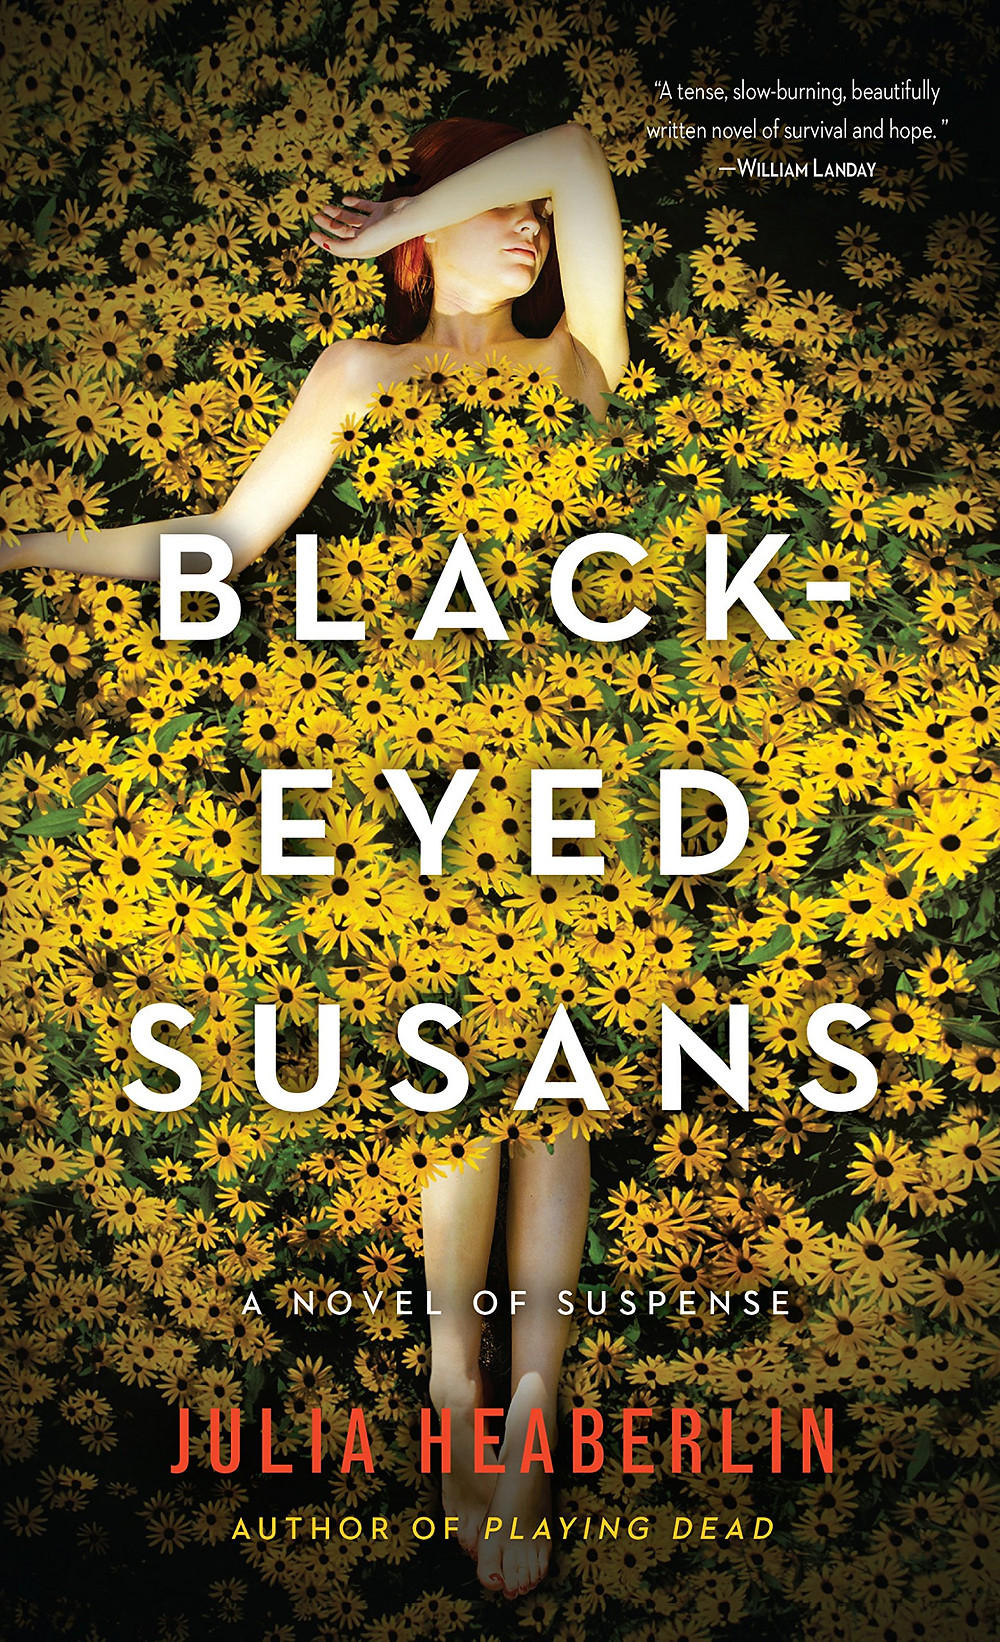 Black Eyed Susans, by Julia Heaberlin. Review by Barbara Copperthwaite